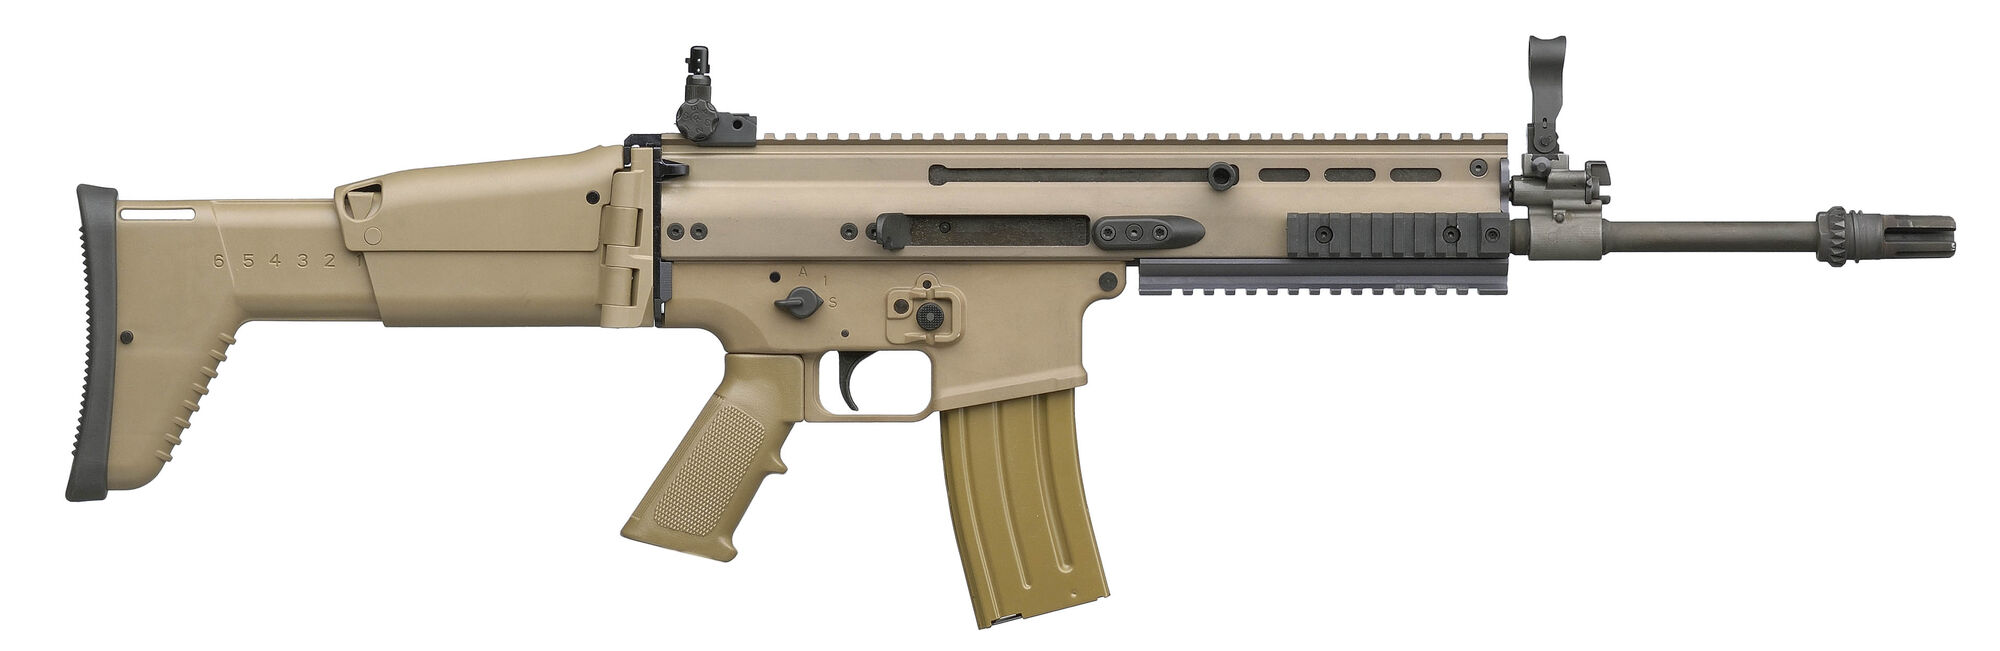 FN SCAR 17S Rifle